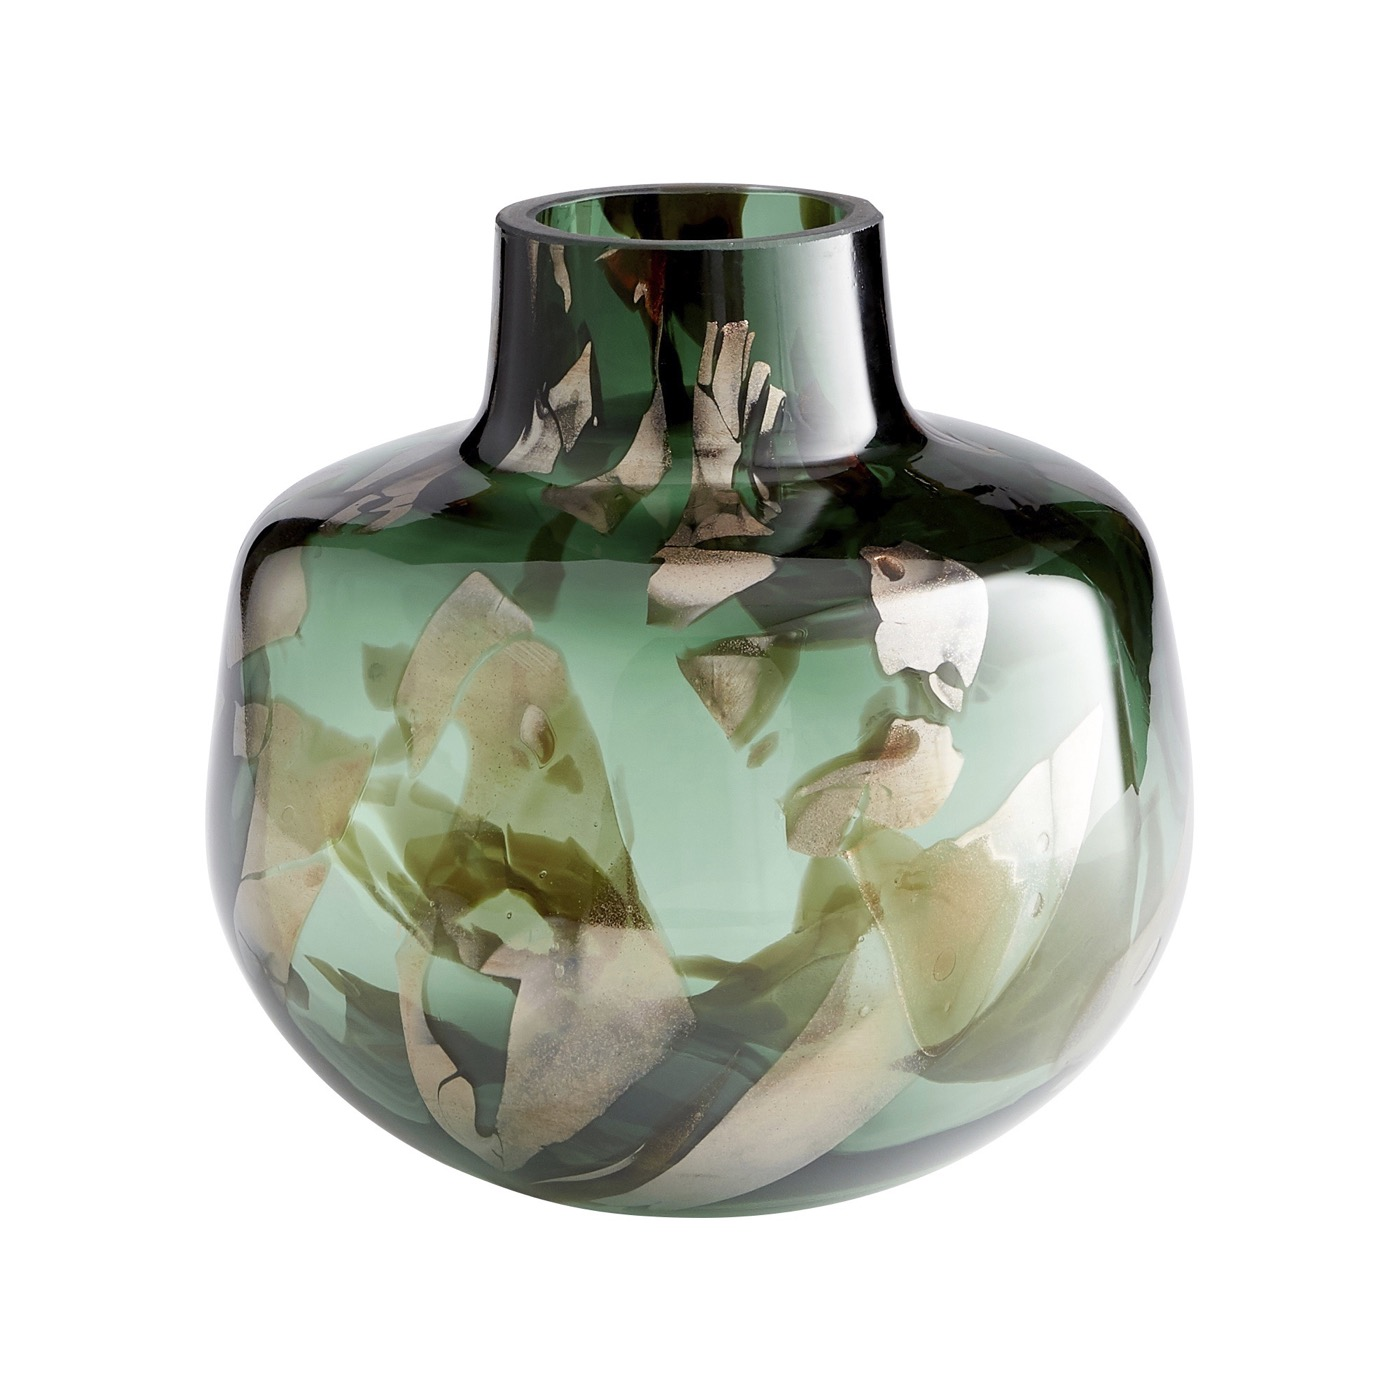 Mayella Green Glass Vases